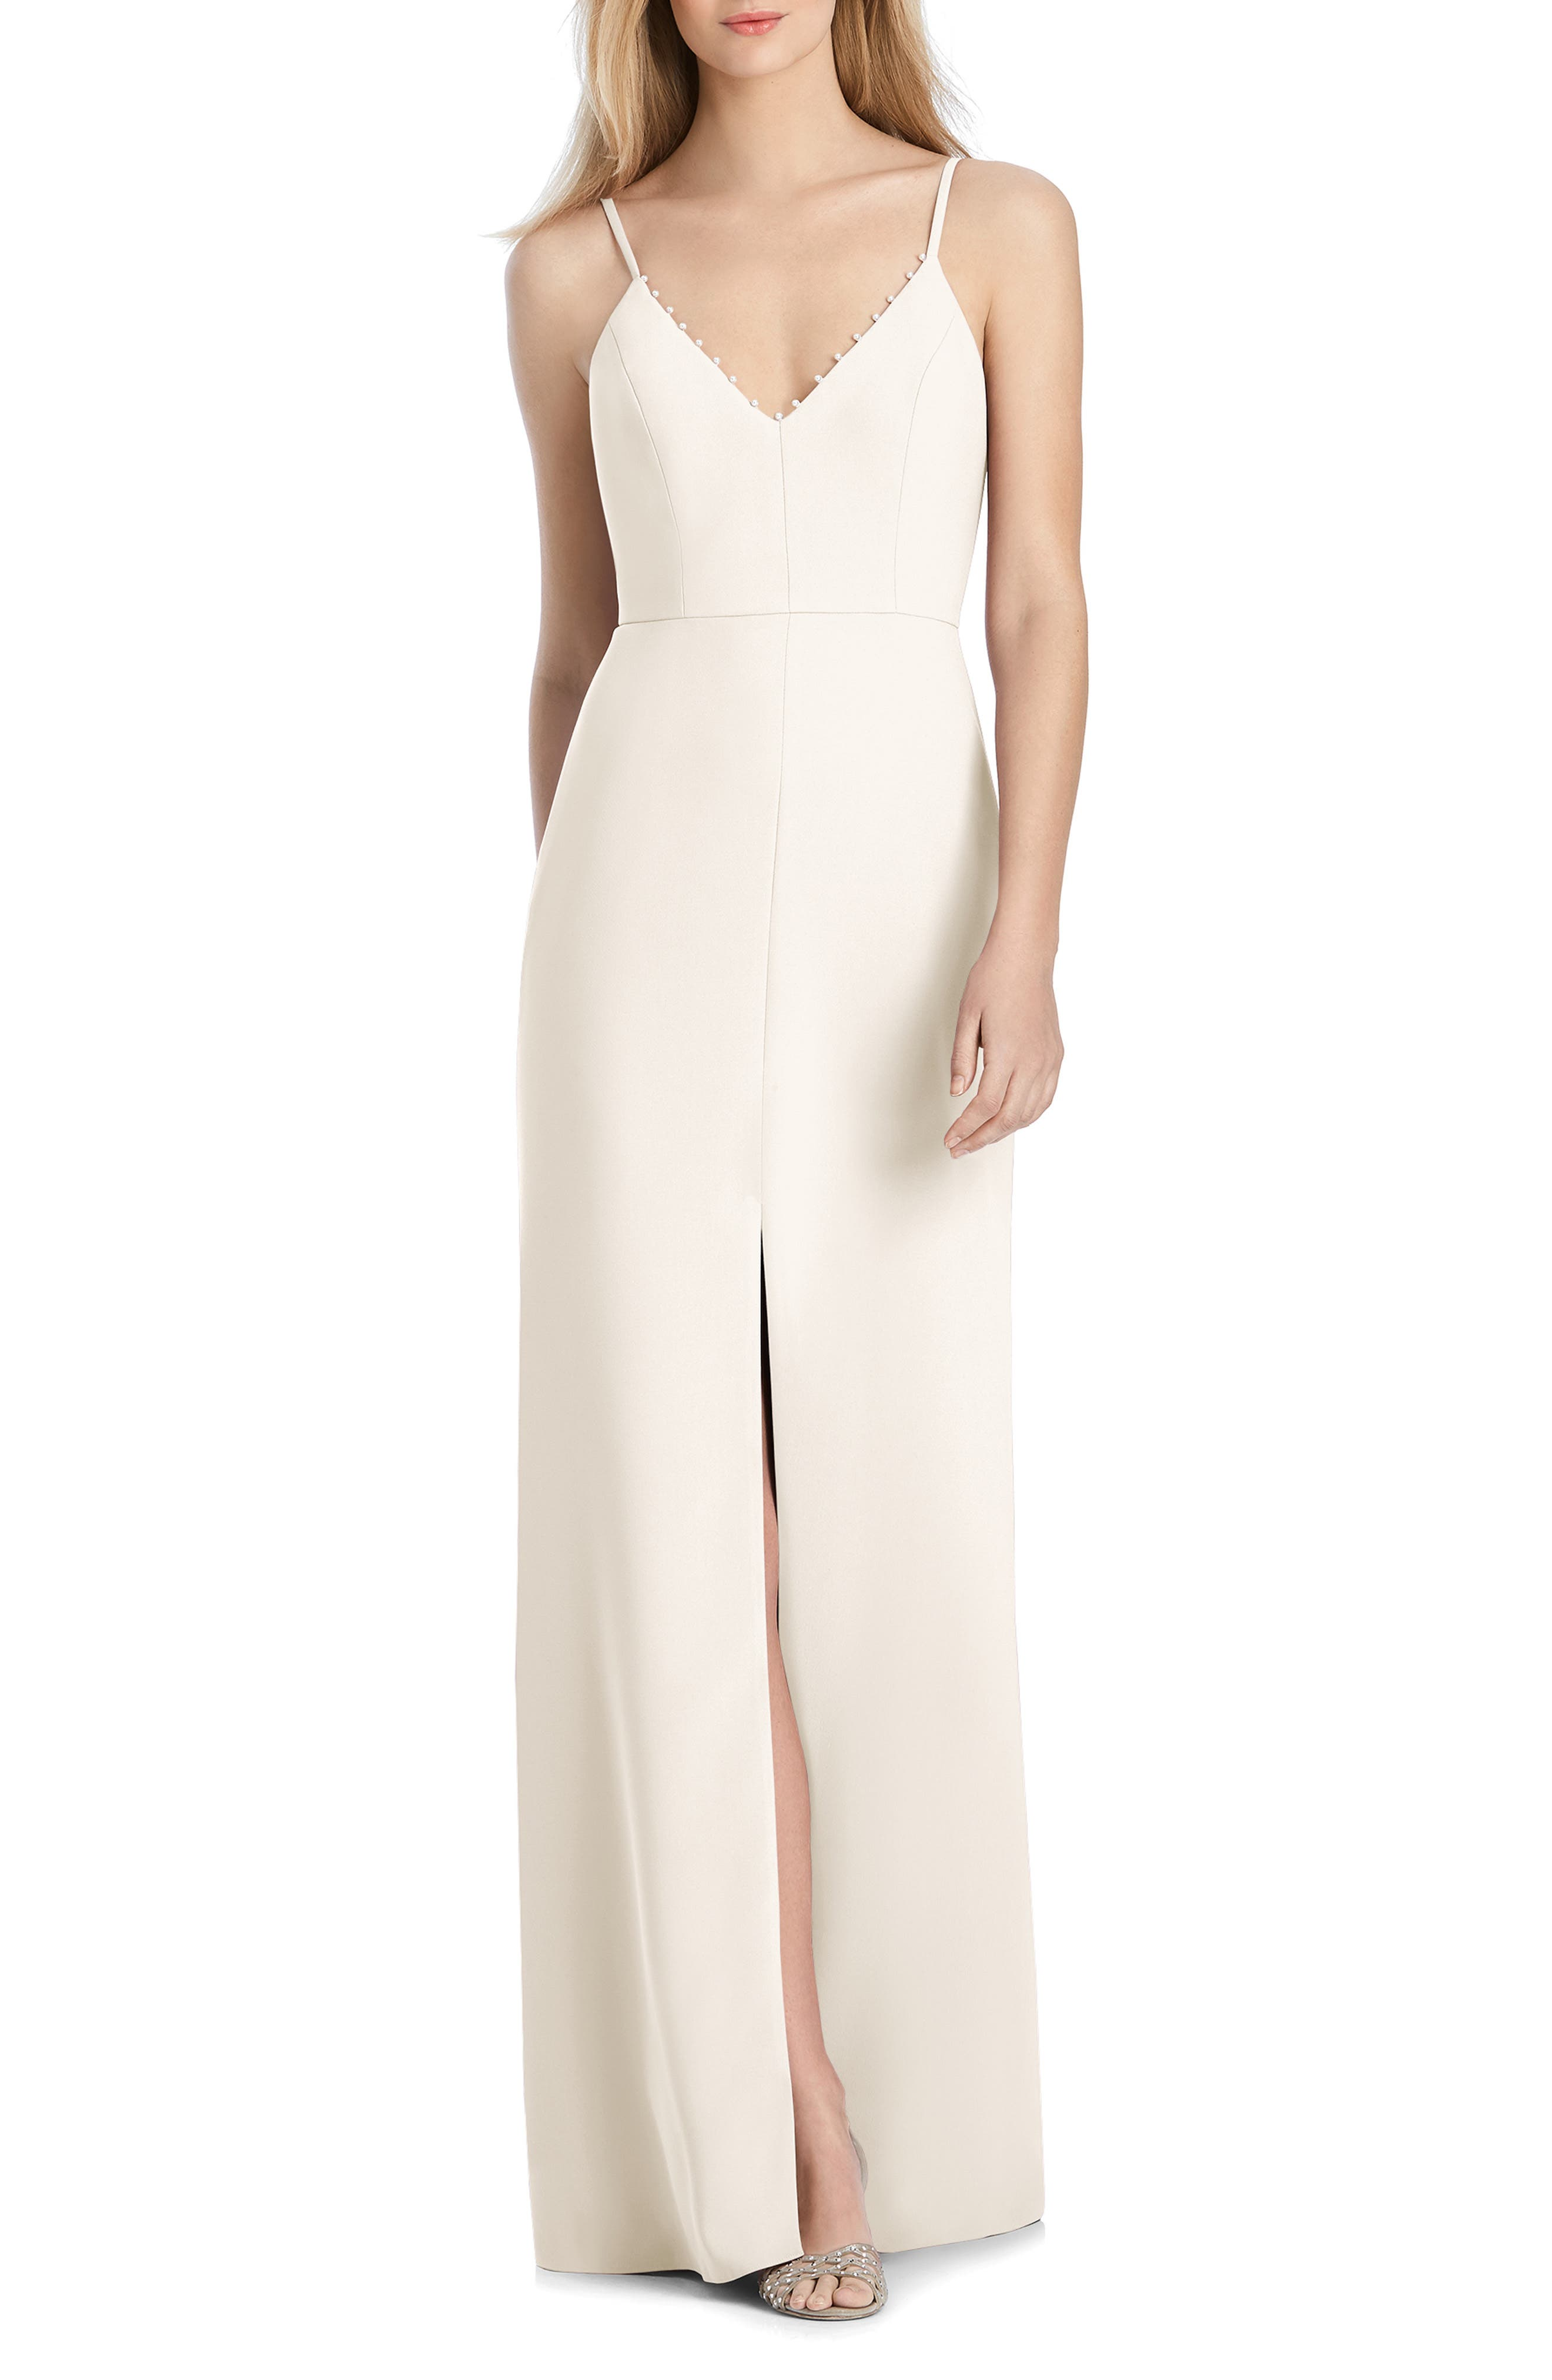 Lela Rose Bridesmaid V-Neck Crepe Mermaid Gown, Ivory